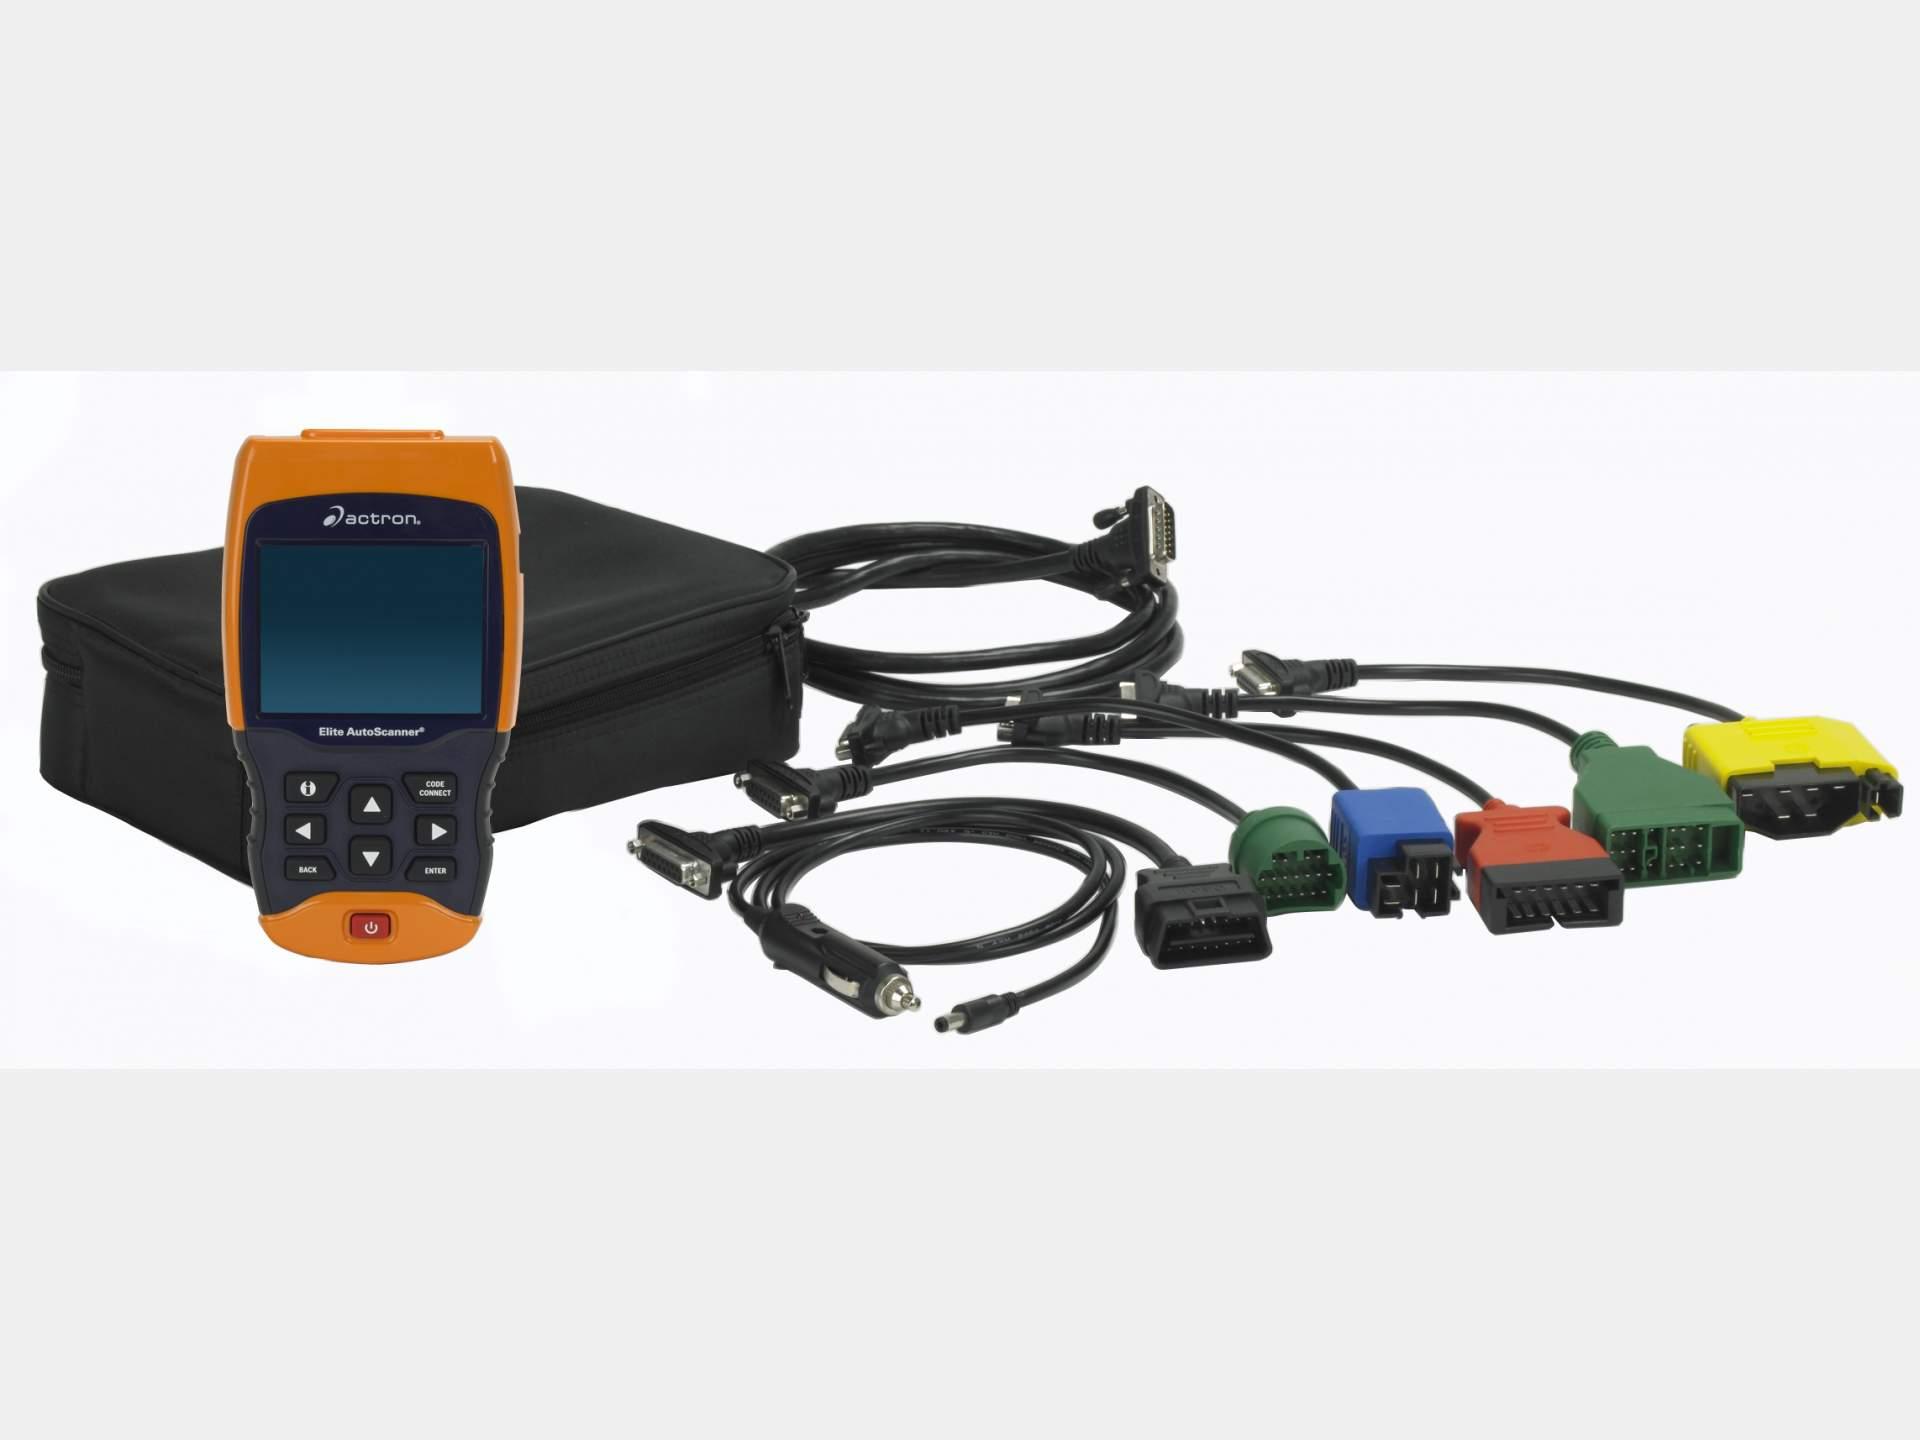 Elite Autoscanner Kit Enhanced Obd I Ii Scan Tool 1300 Obd2 Wiring Diagram And